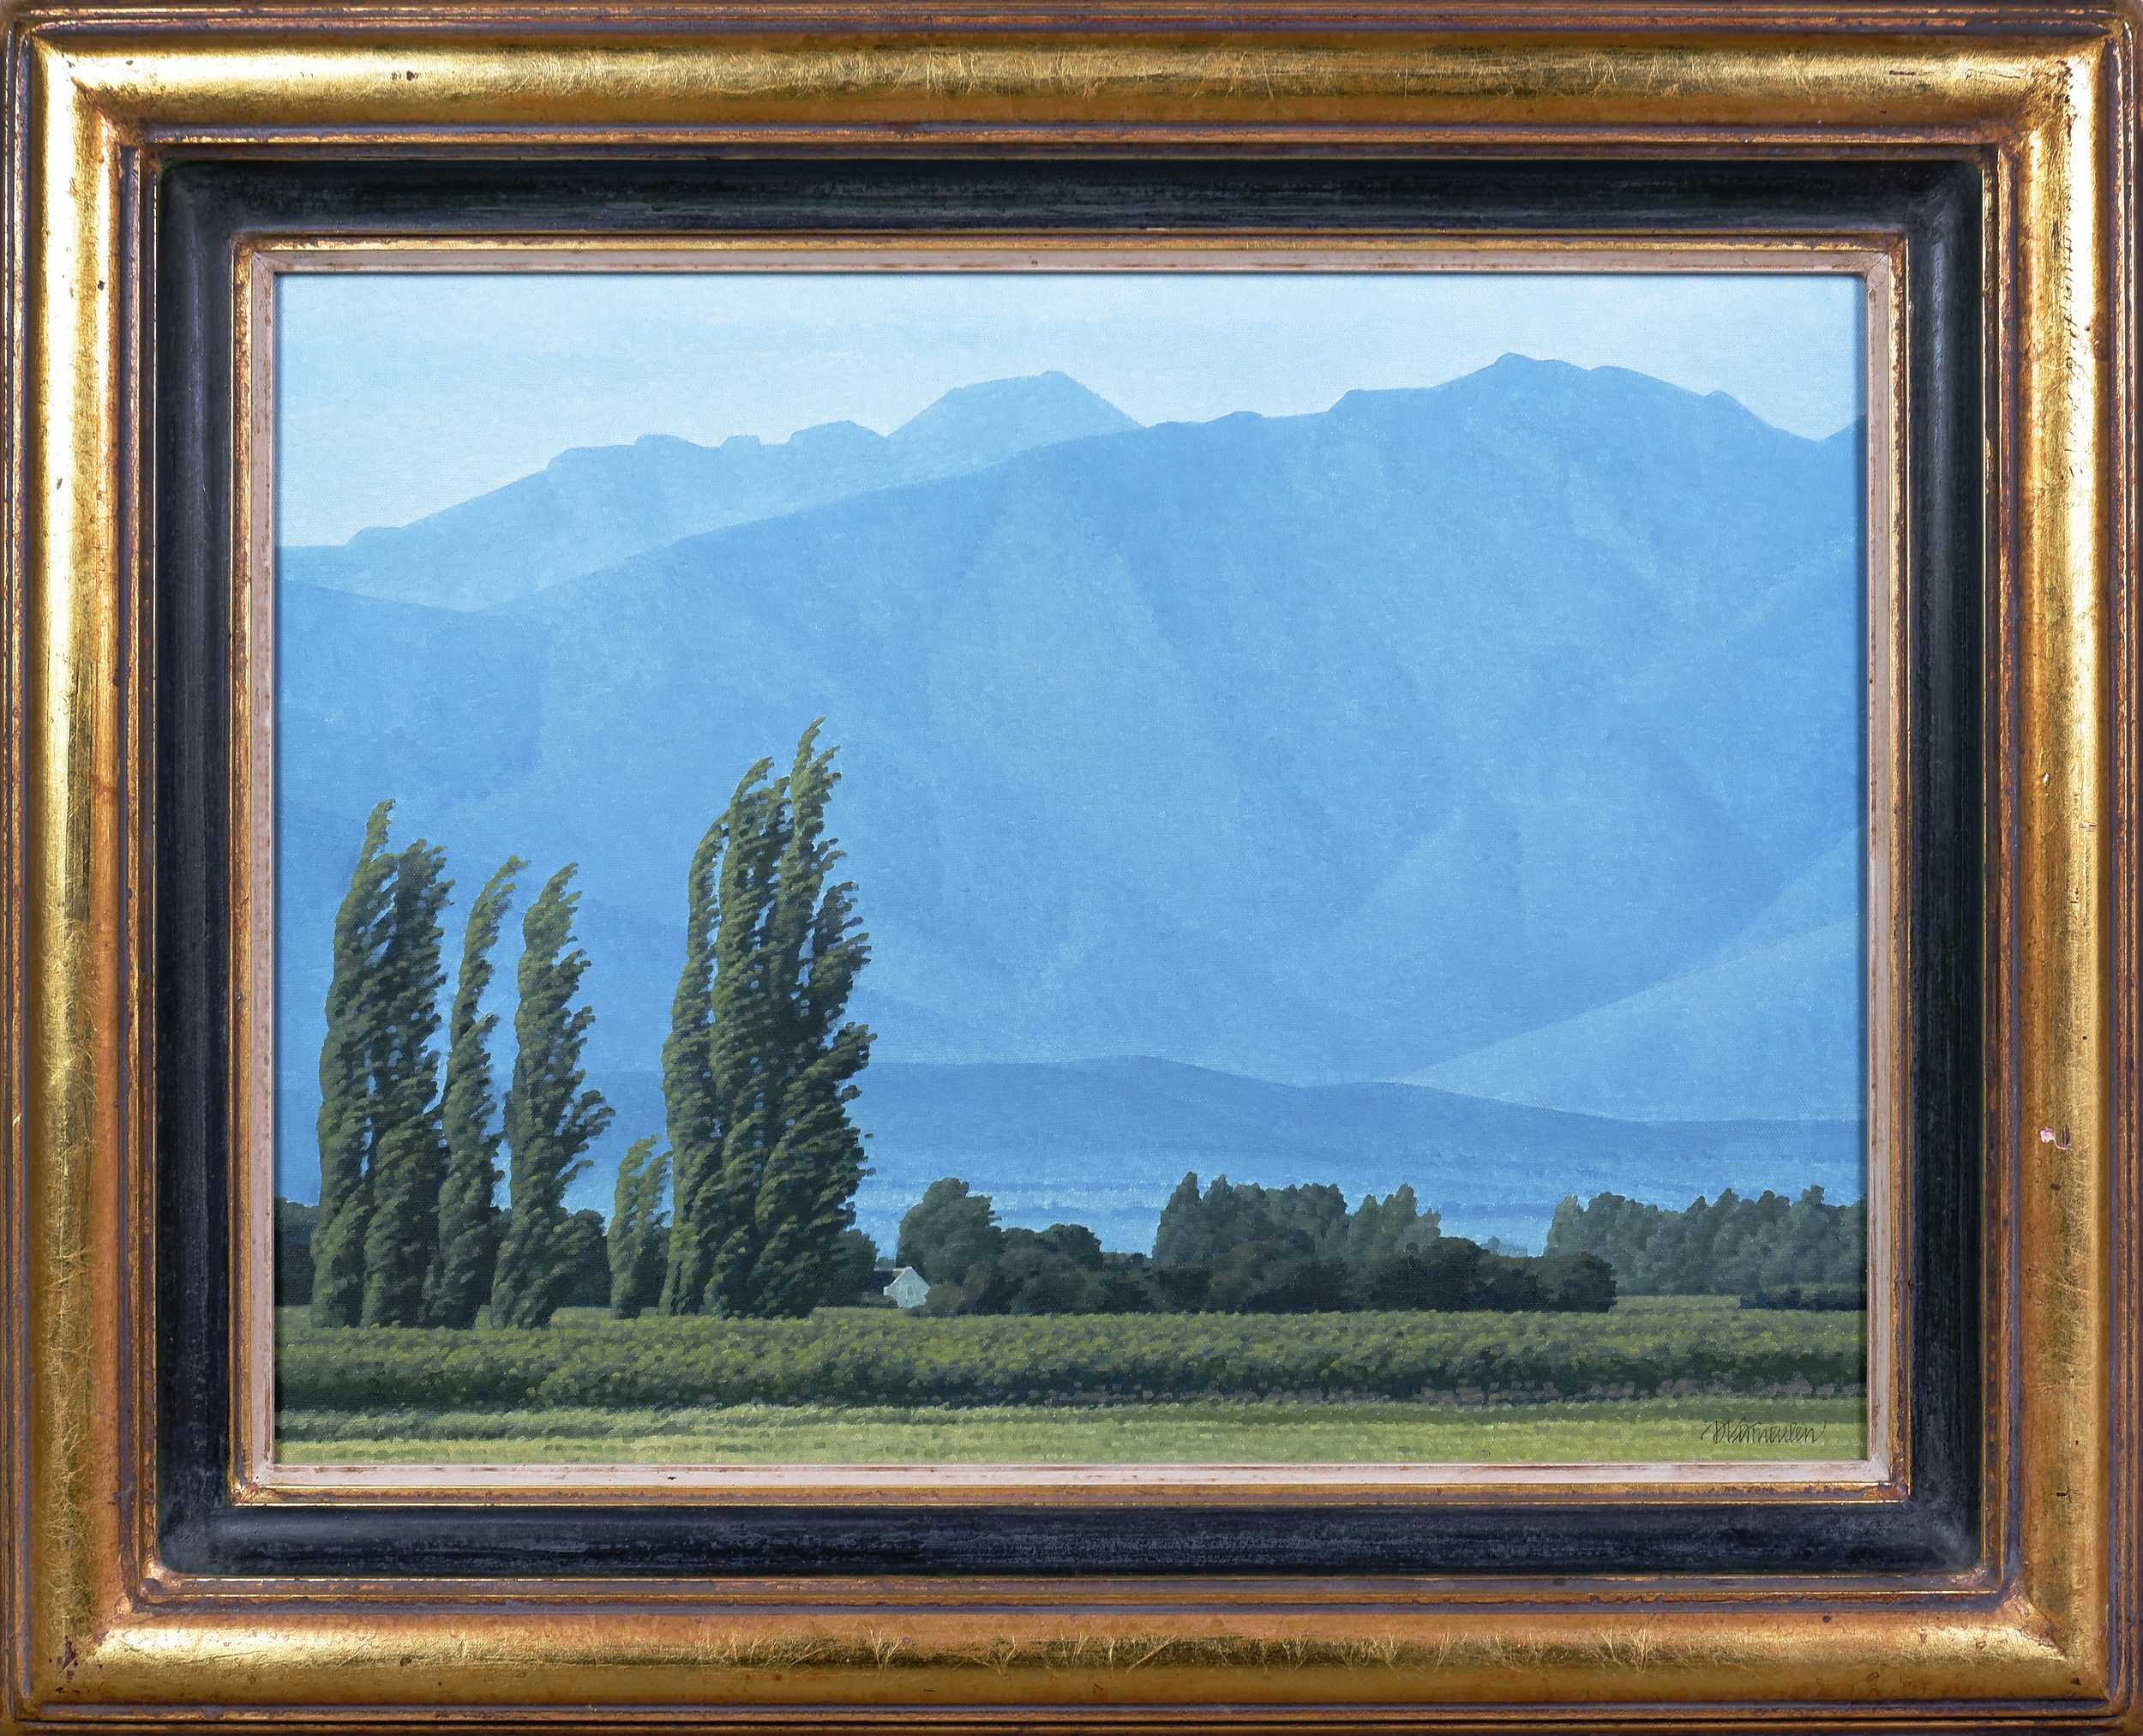 'Daan Vermeulen (born 1938, South African), Mountain Wind, Worcester, Oil on Canvas'